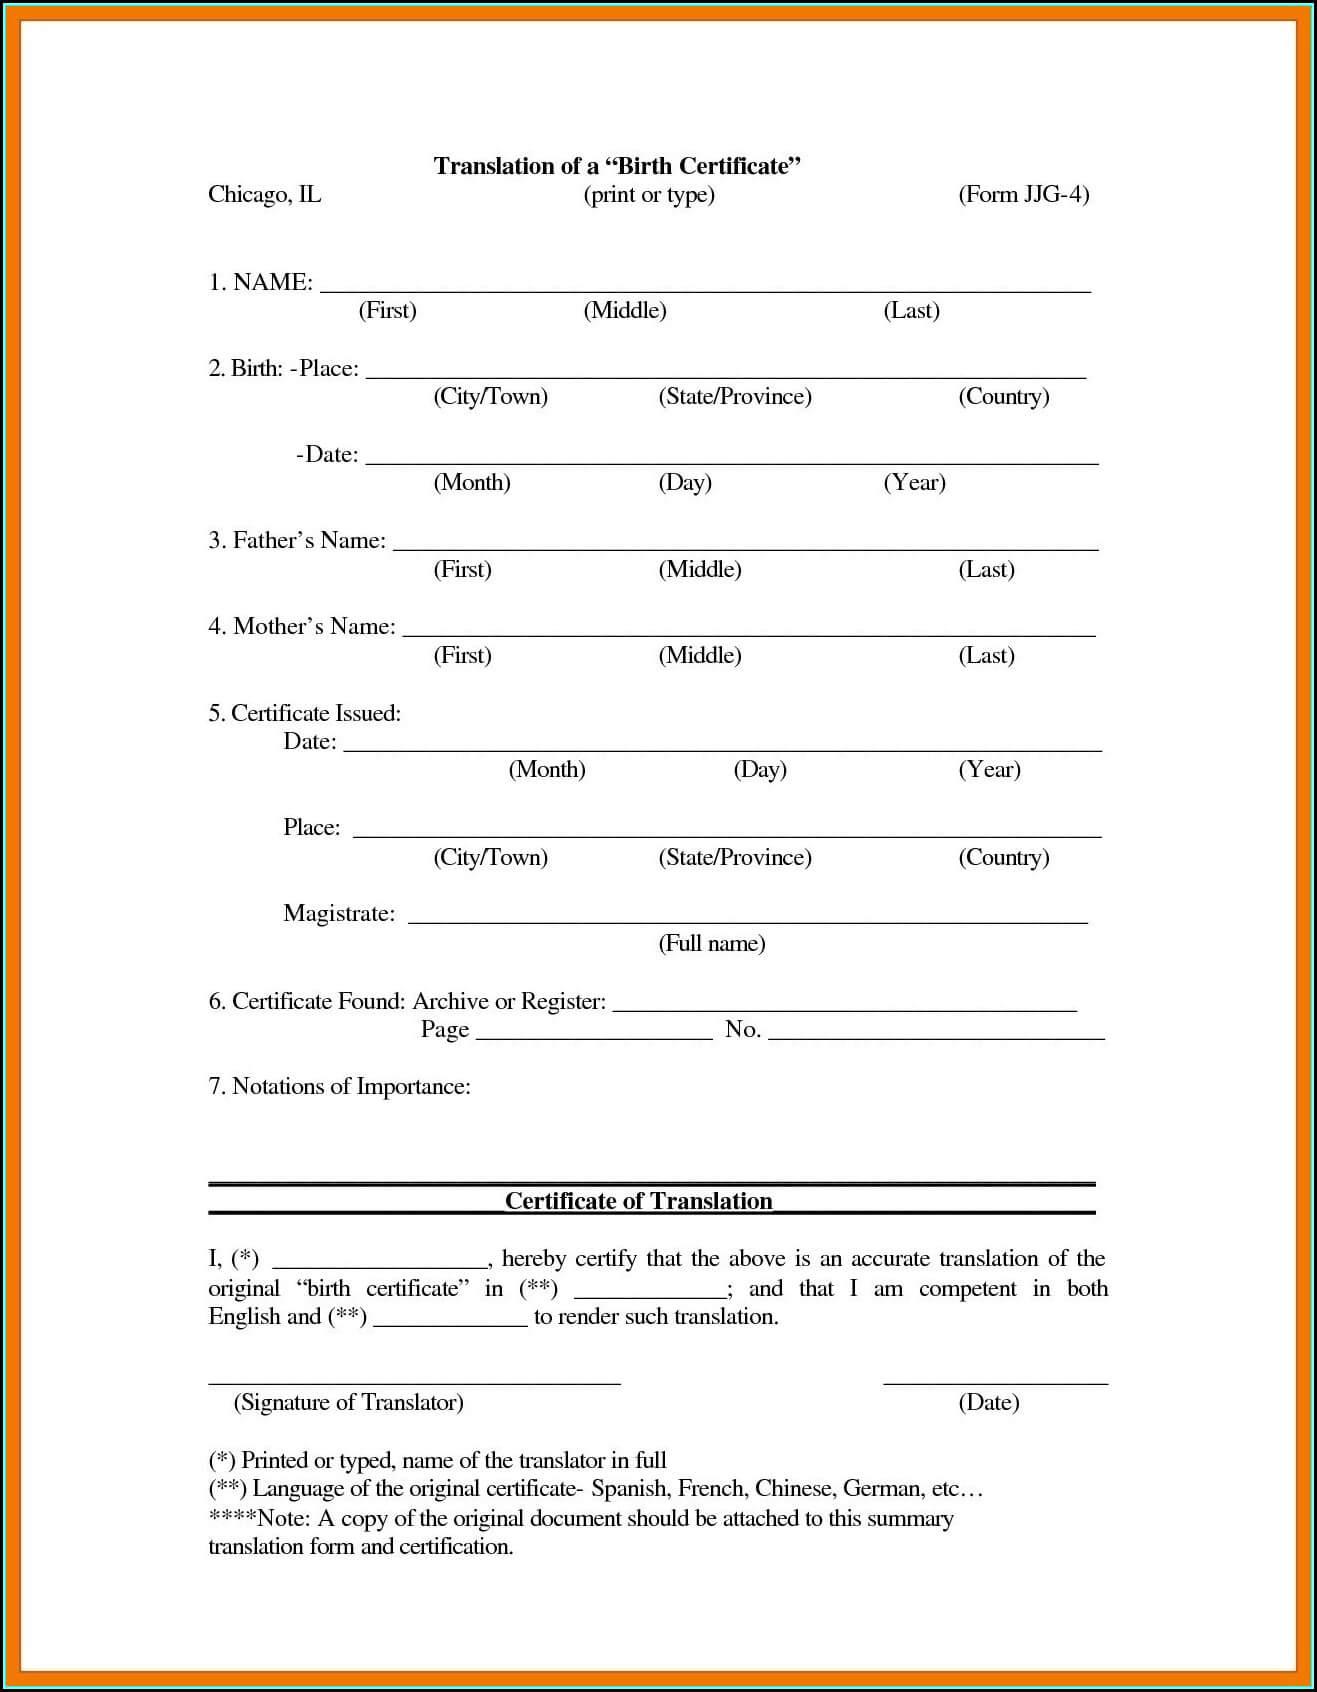 Birth Certificate Translation Template Uscis - Template 1 Within Uscis Birth Certificate Translation Template